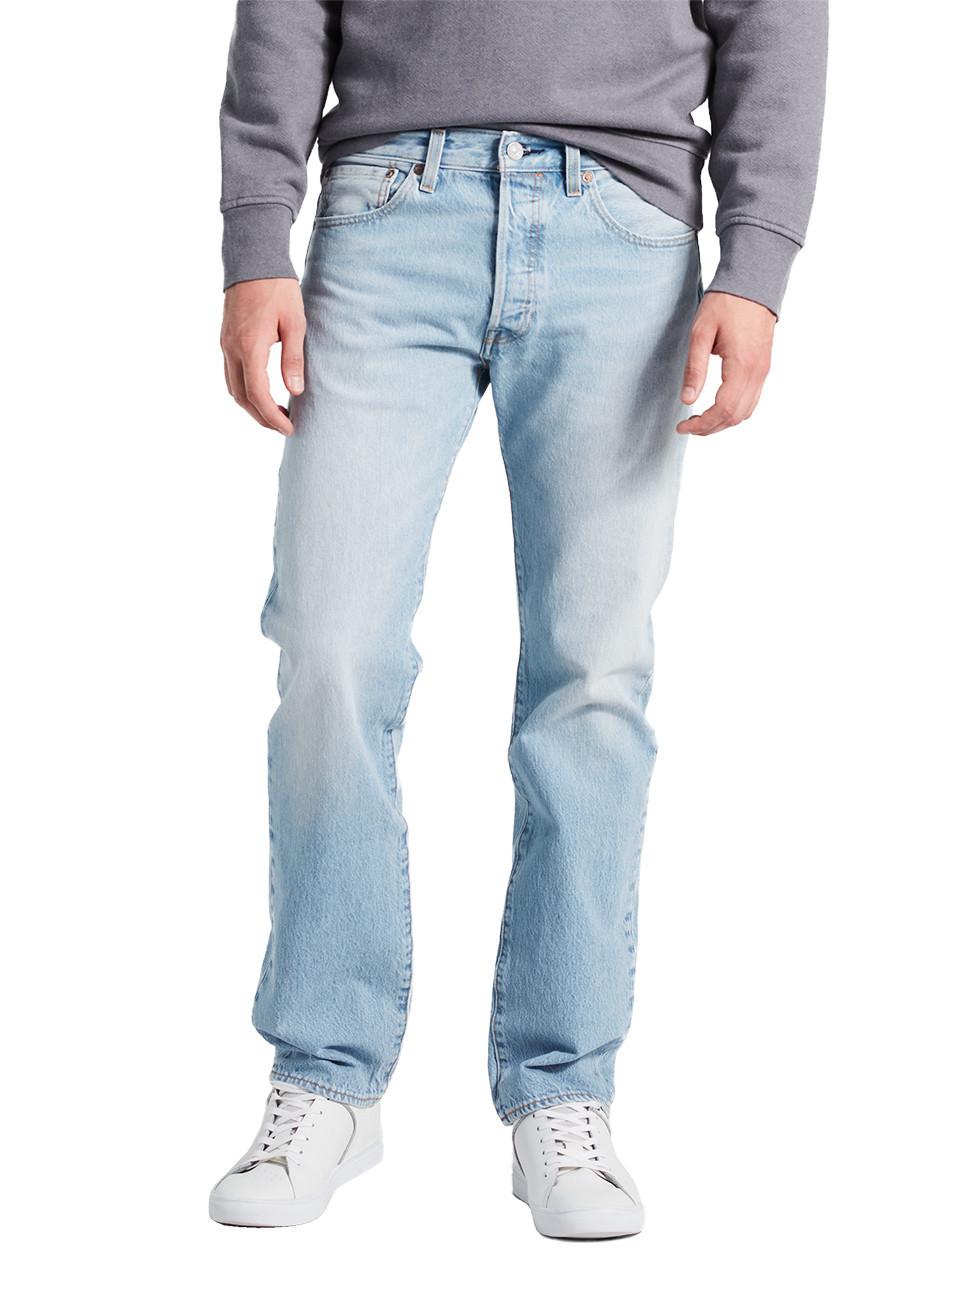 [Jeans-direct] 20% extra auf alle Sale-Produkte, zB.: Herren Levis Jeans 501, Original Fit